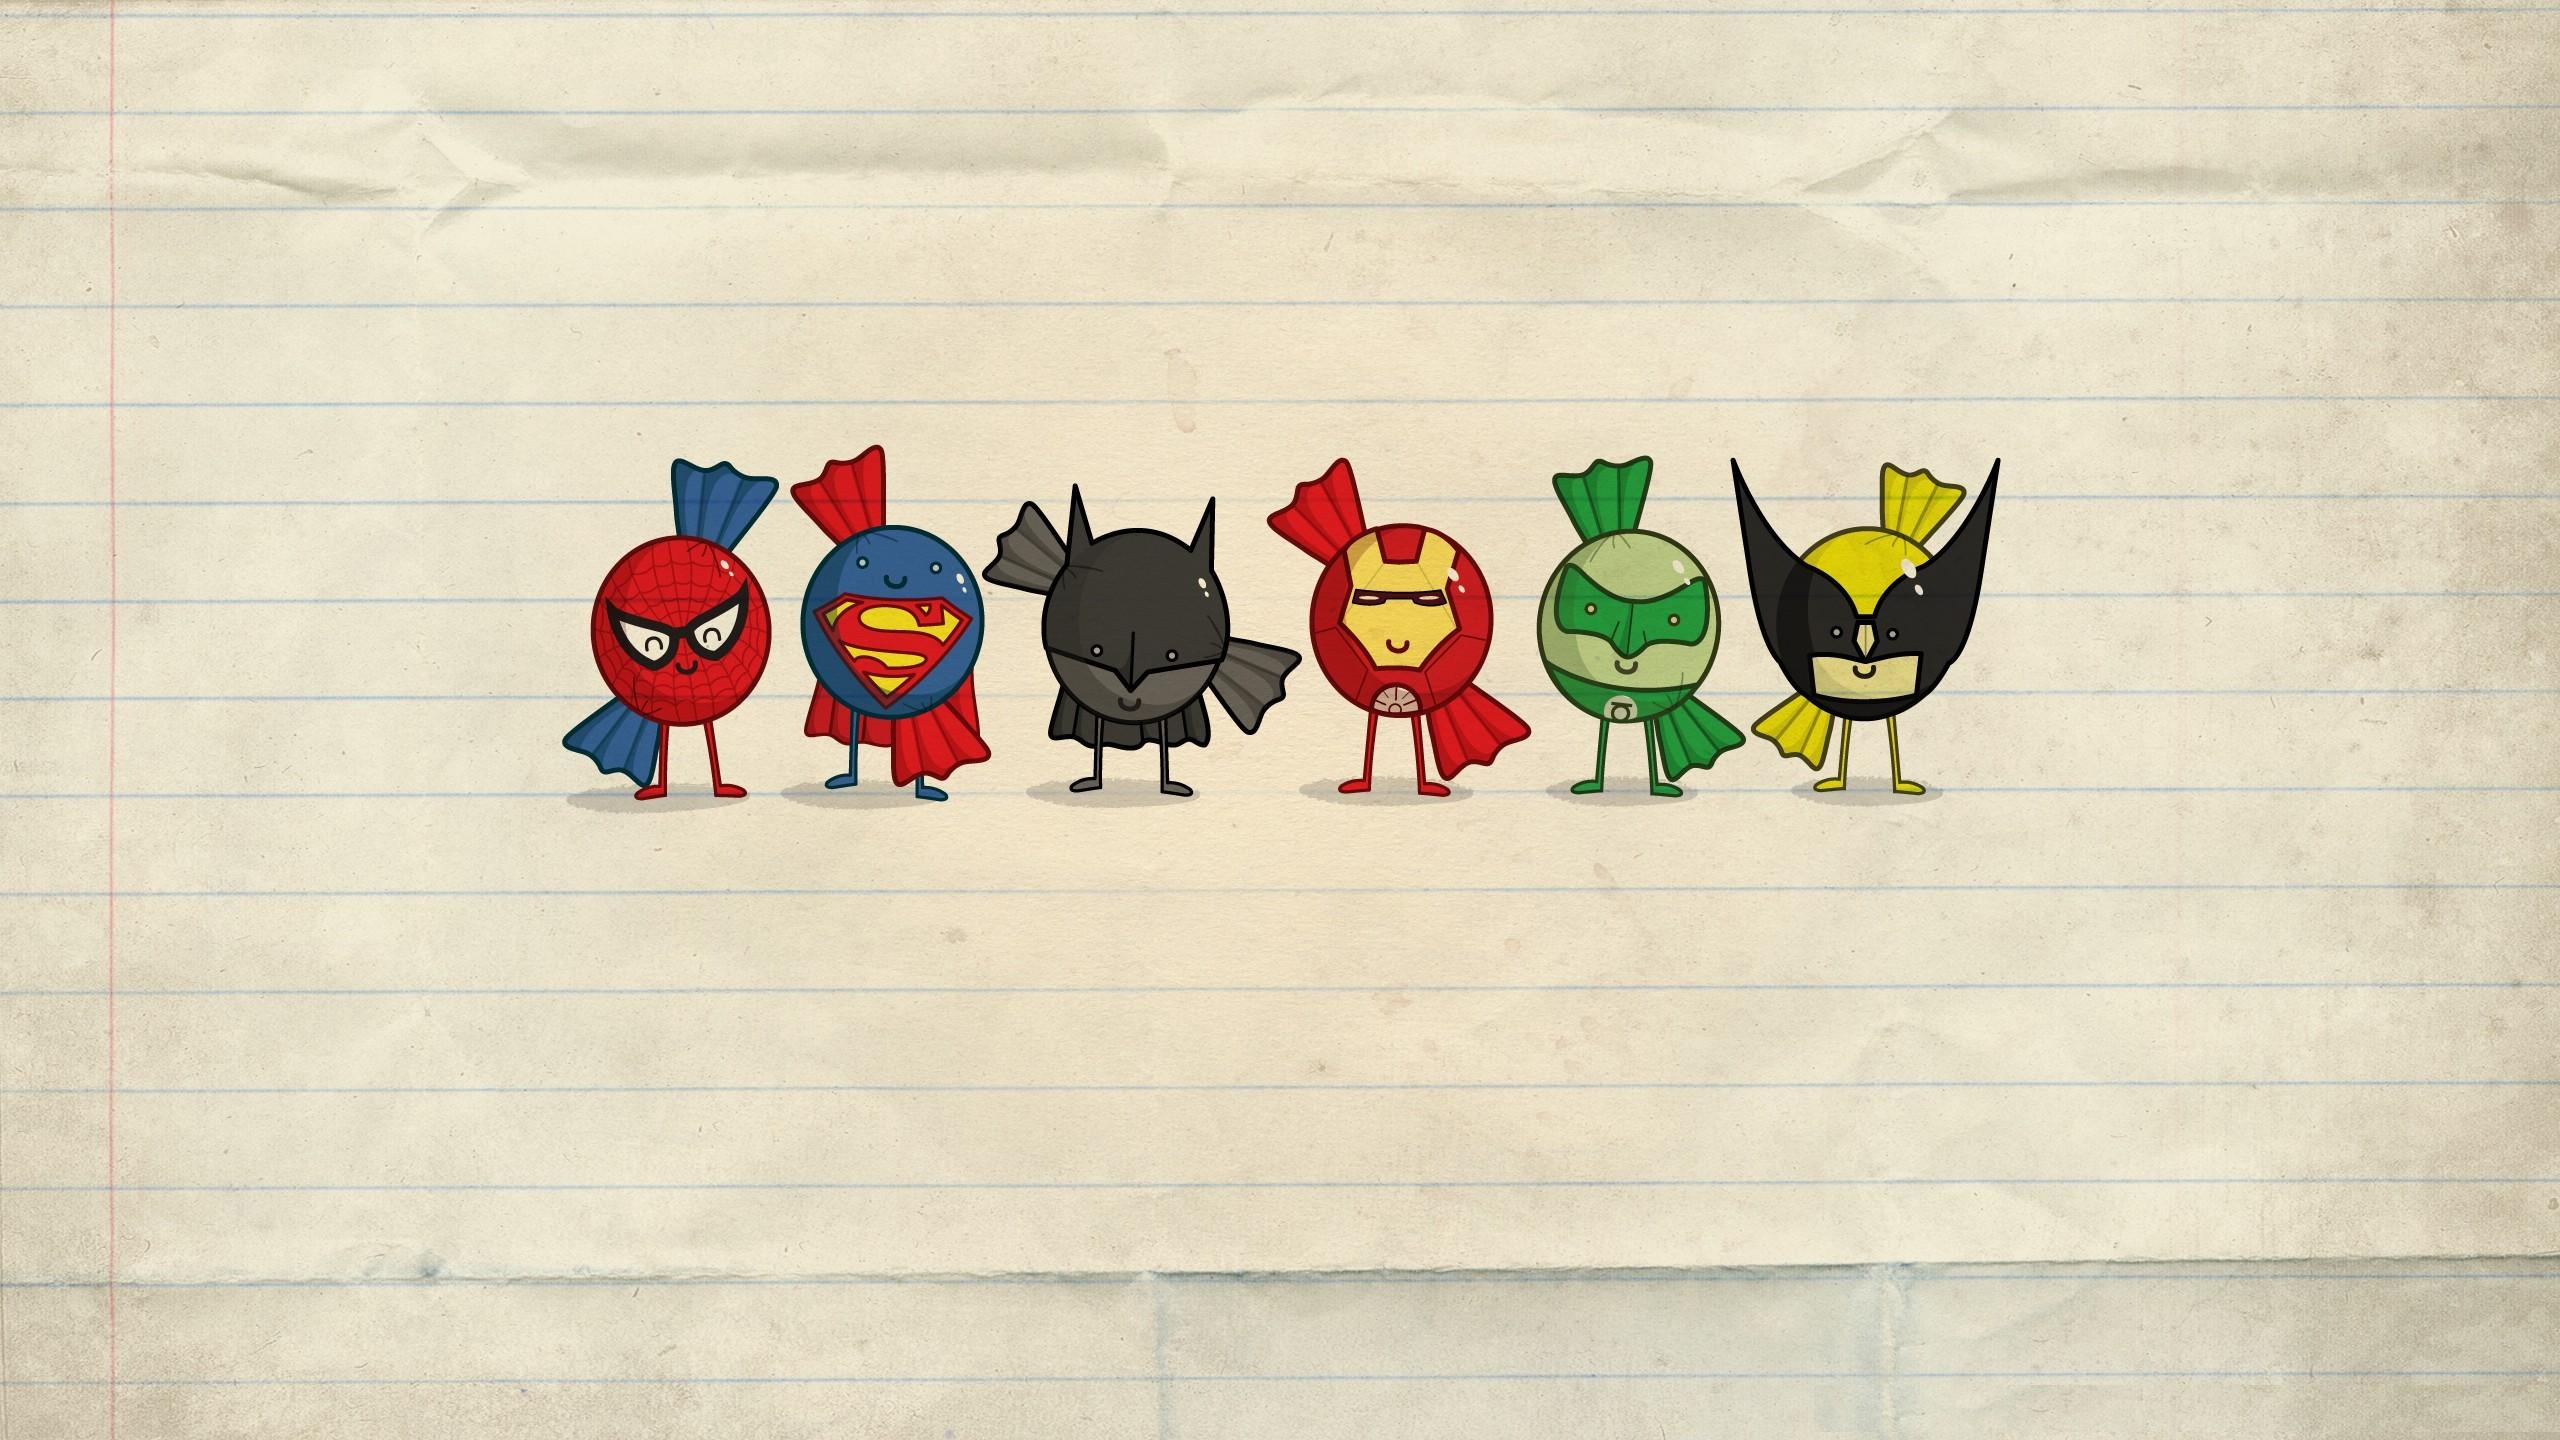 Iron Man Animated Wallpaper Jla Avengers Hd Wallpaper Background Image 2560x1440